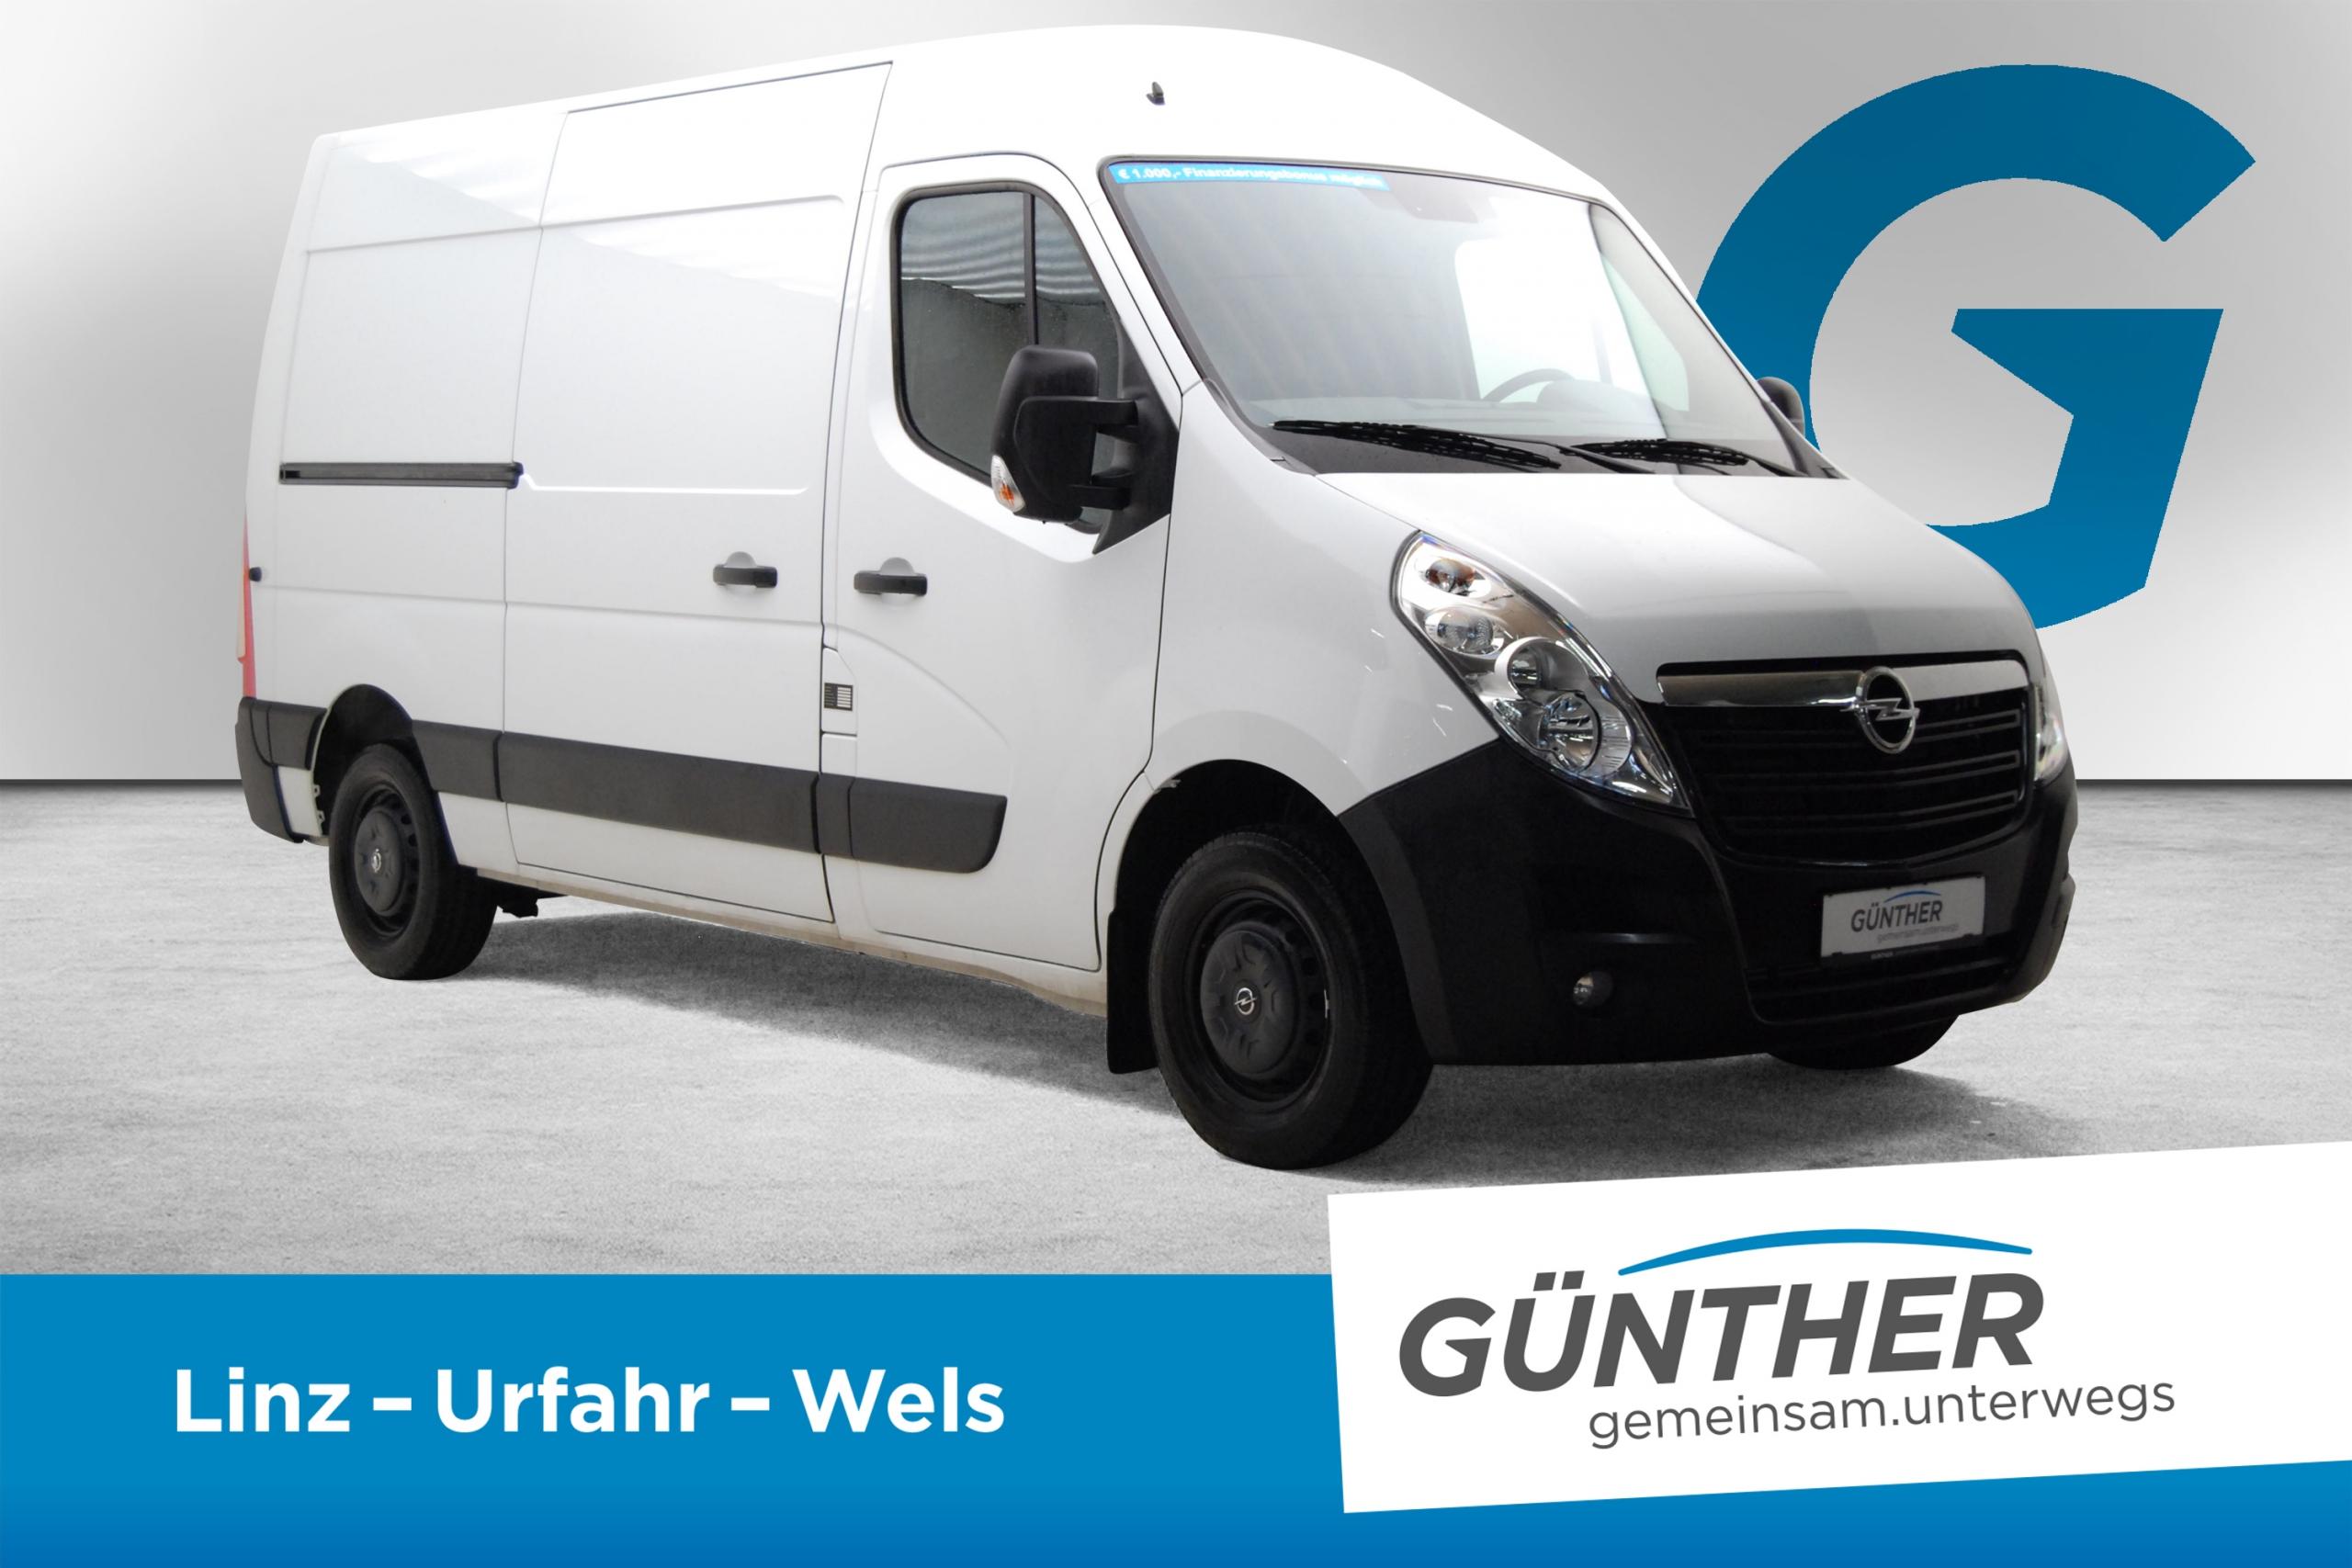 Fotoservice Opel Günther